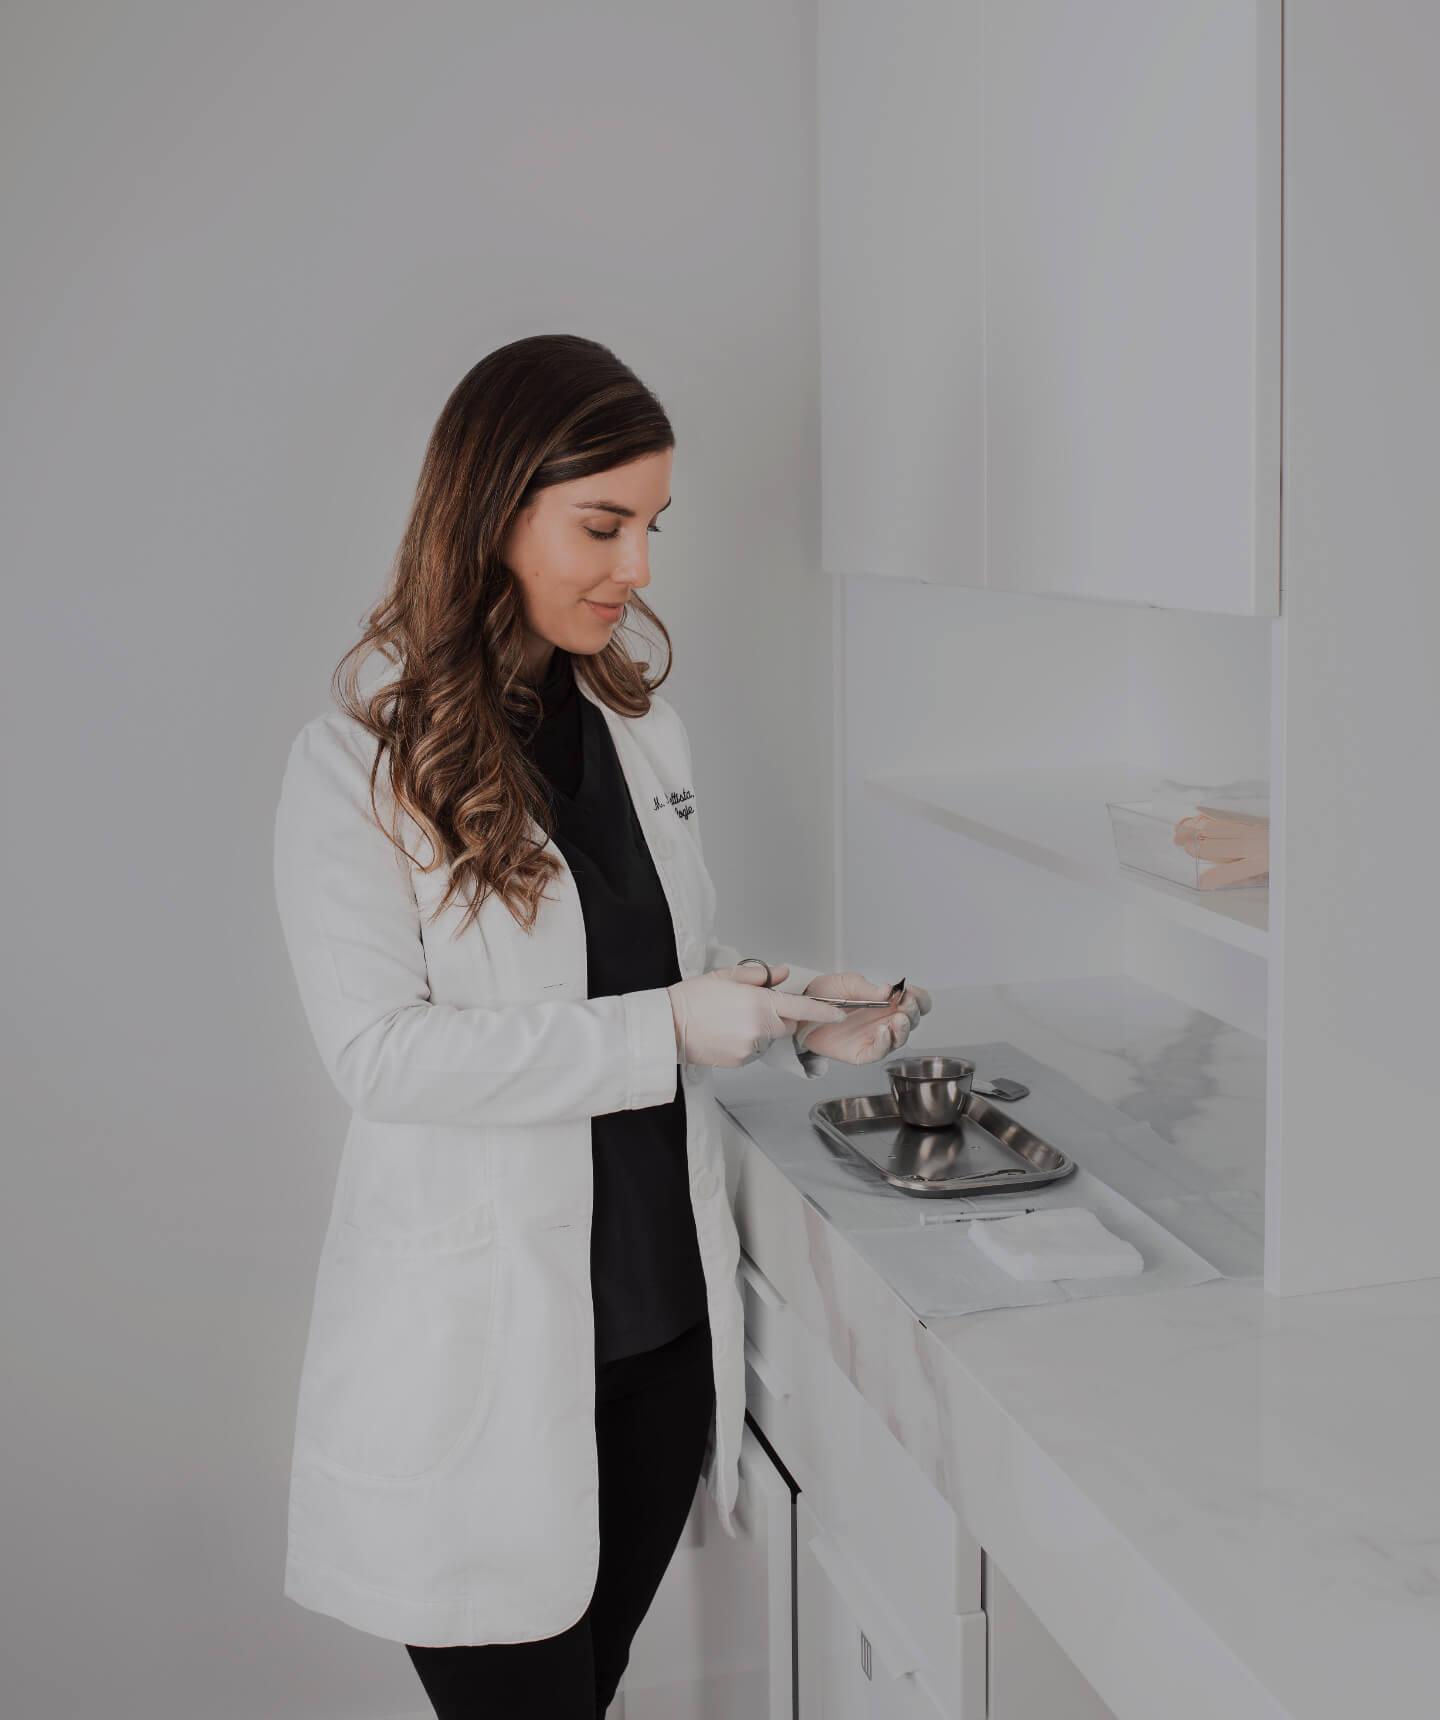 Dr. Melissa Nantel-Battista, dermatologist and Mohs surgeon at Clinique Chloé in Montreal.